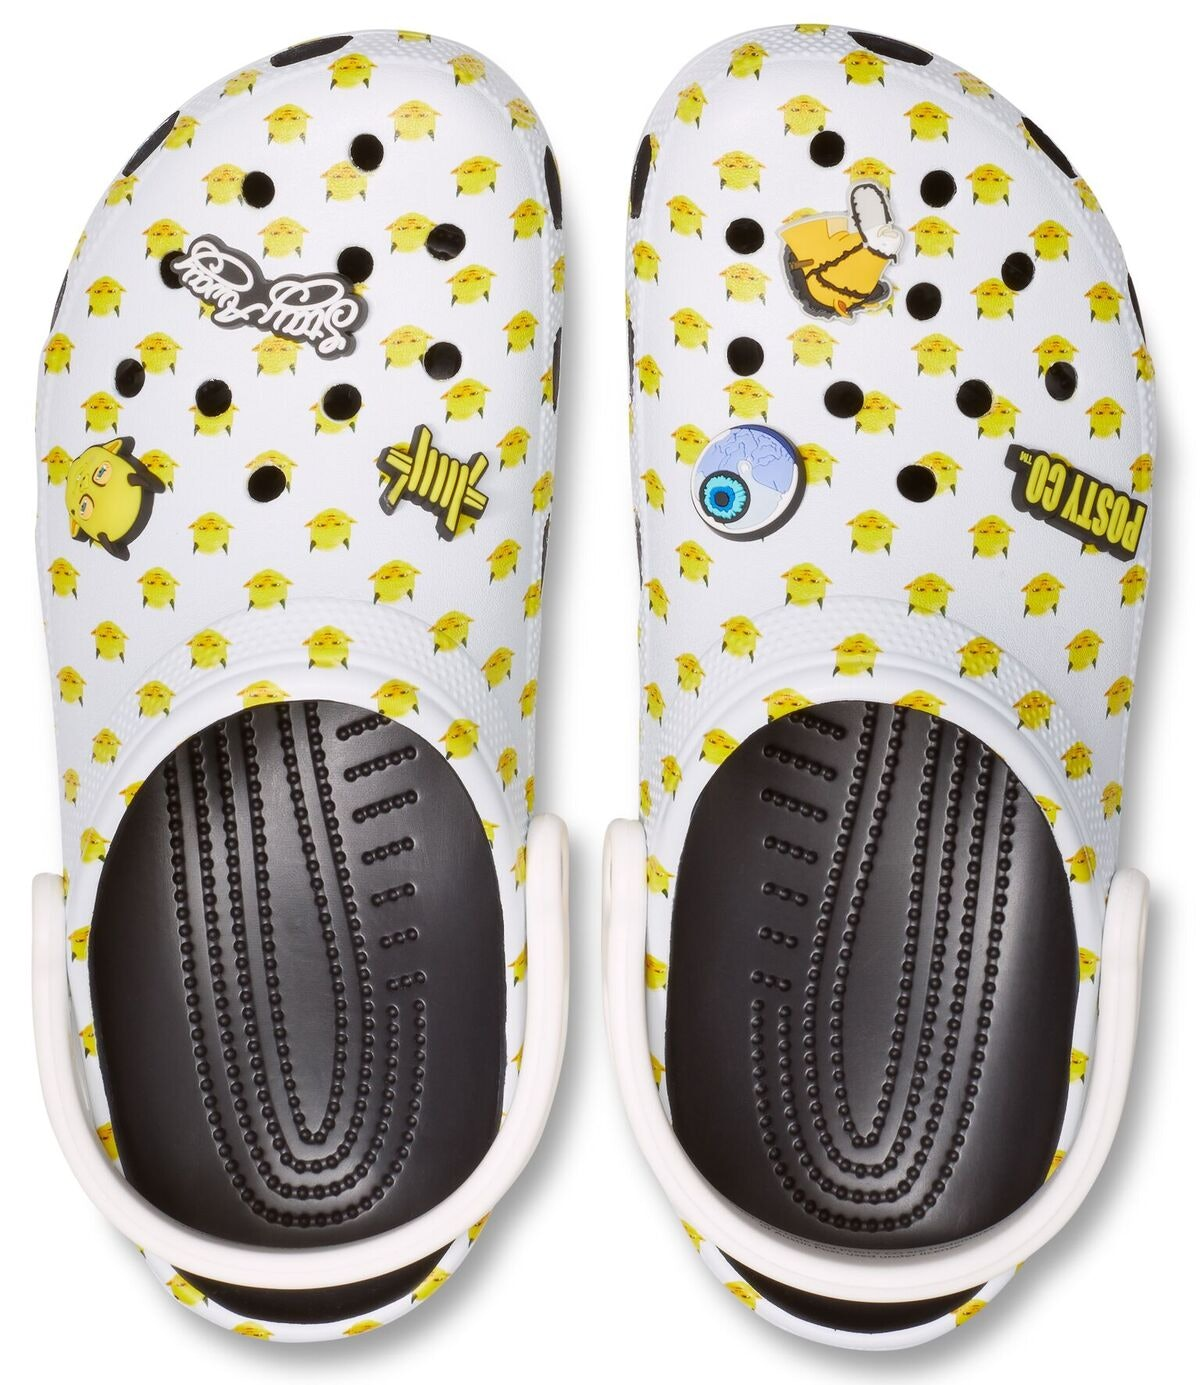 quality design f8fe8 b2bbf Where Can You Buy The Post Malone x Crocs Dimitri Clogs? You ...